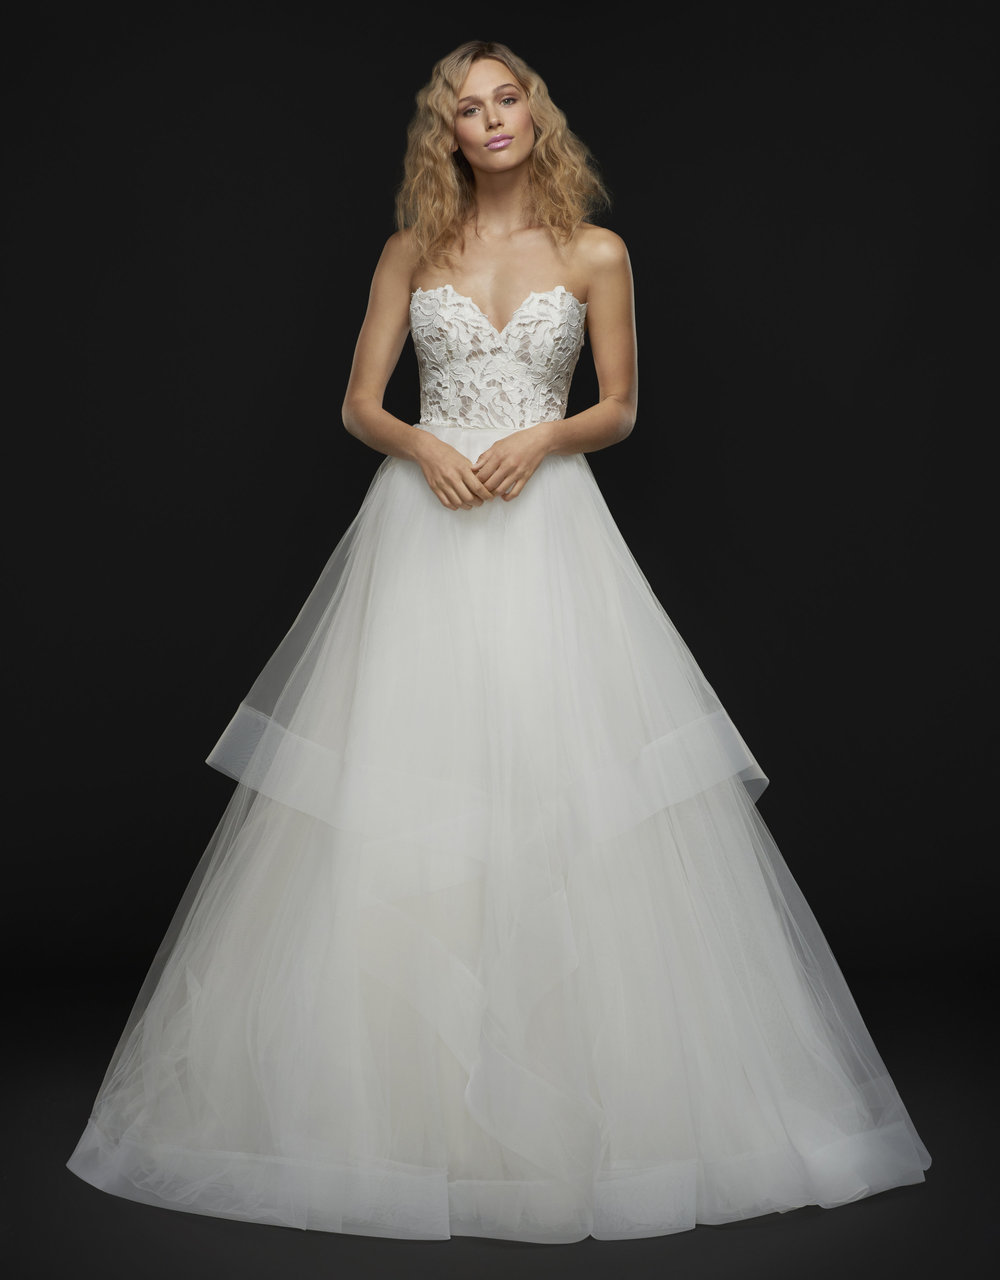 blush-hayley-paige-bridal-fall-2017-style-1760-dayton_ivory-and-beau-savannah-bridal-boutique-savannah-wedding-dresses-savannah-bridal-shopp.jpg